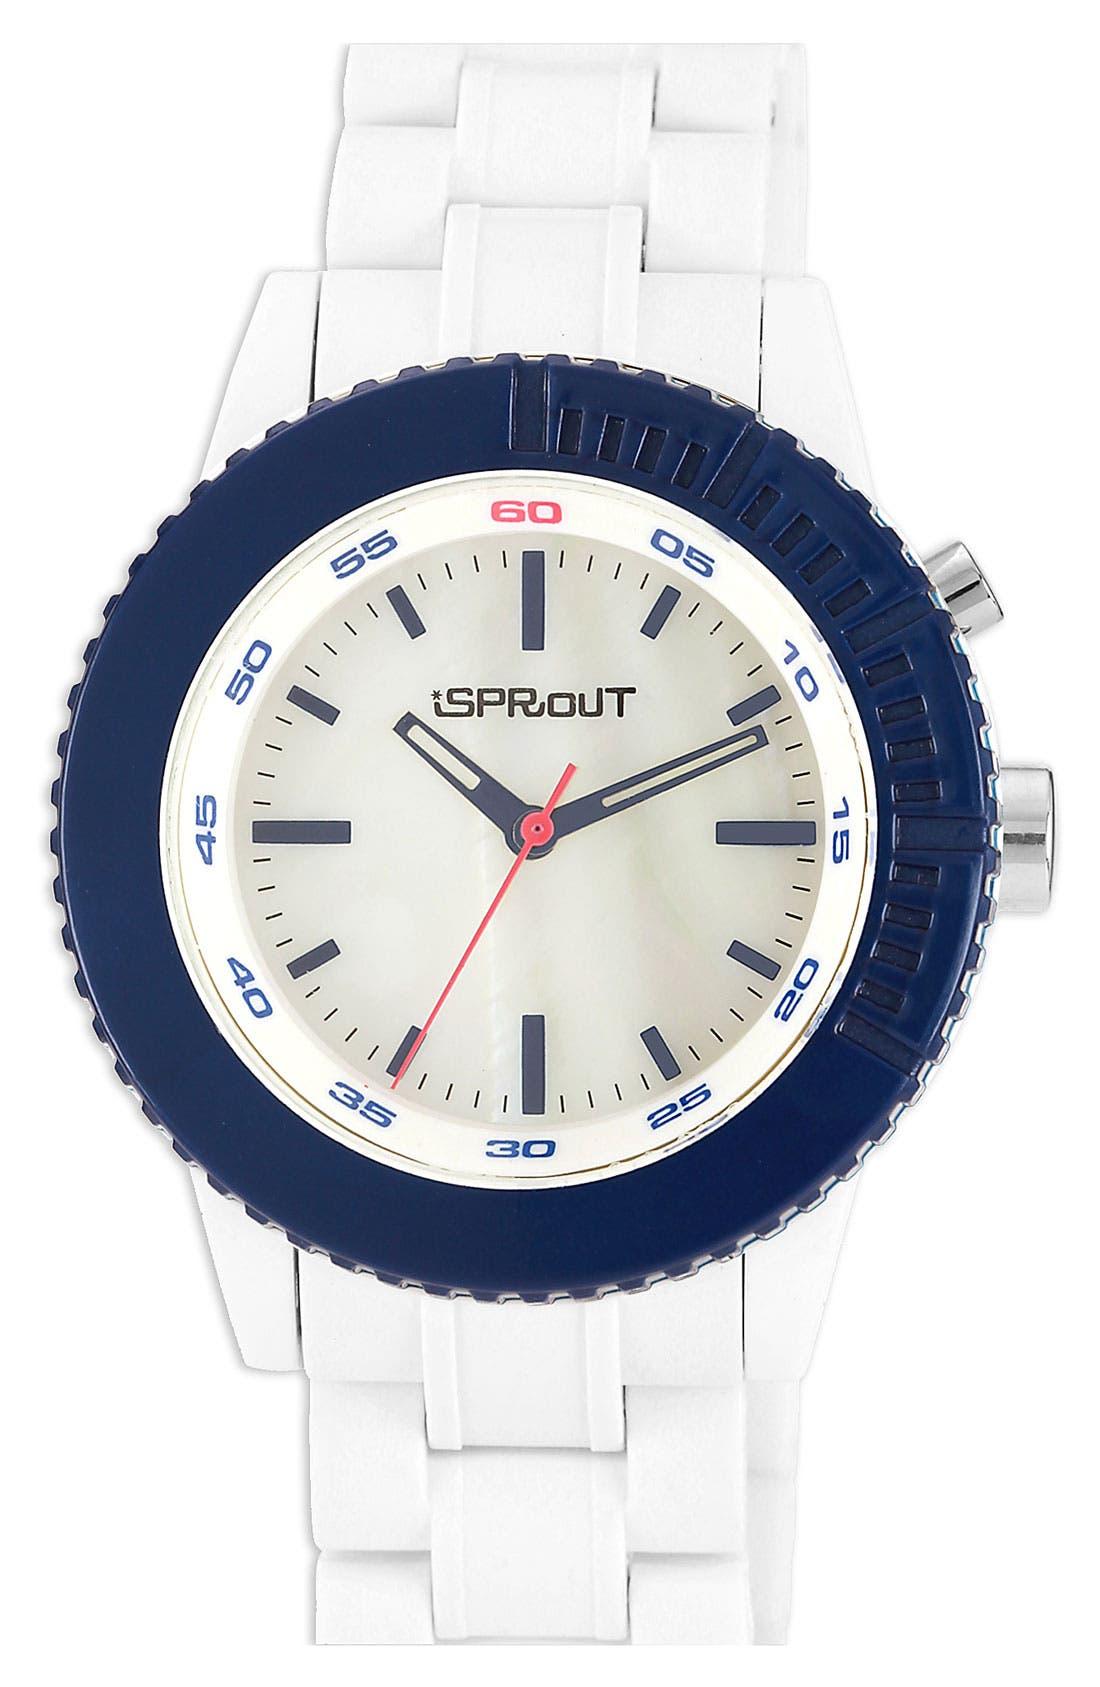 Main Image - SPROUT™ Watches Color Bezel Bracelet Watch, 45mm